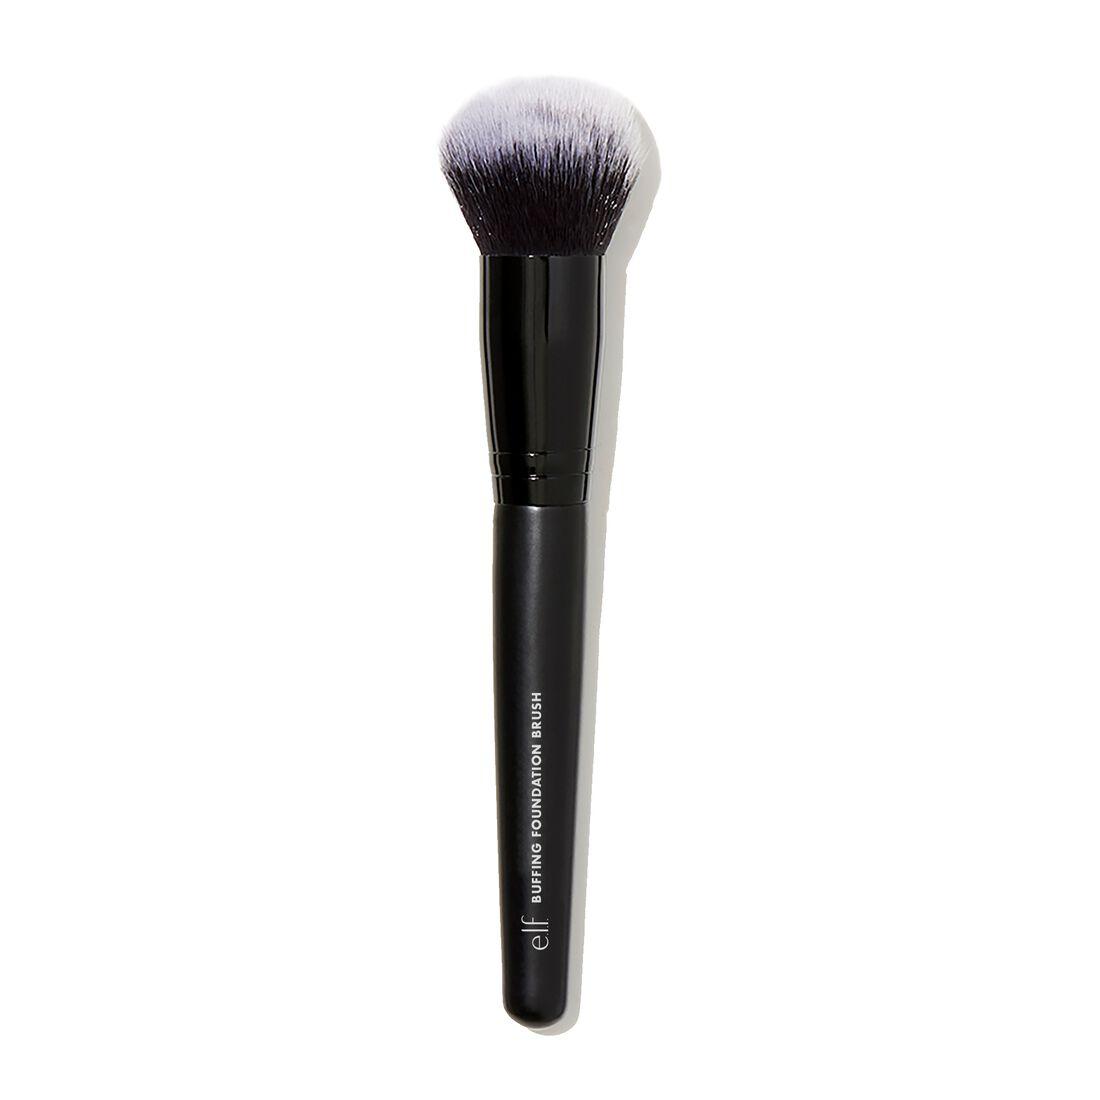 E.l.f Cosmetics - Buffing Foundation Brush